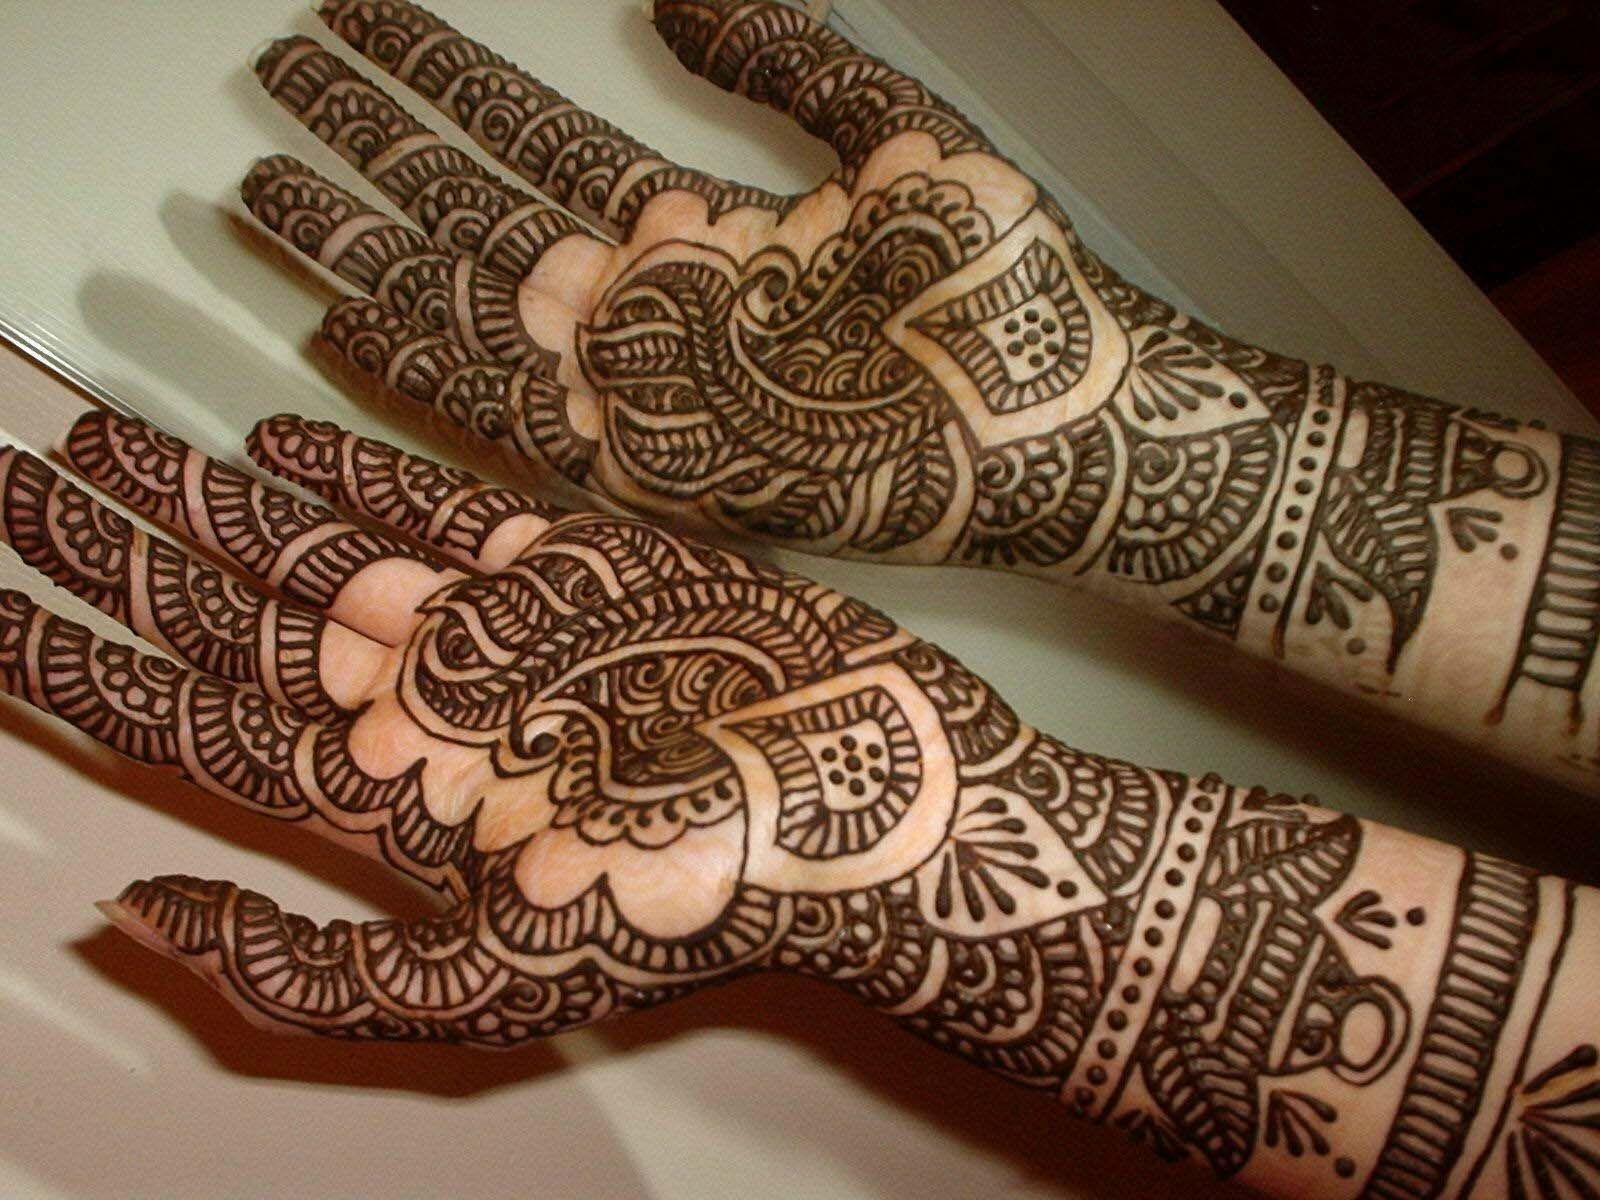 Hindi Hand Tattoo Google Search Tattoos Pinterest Mehndi